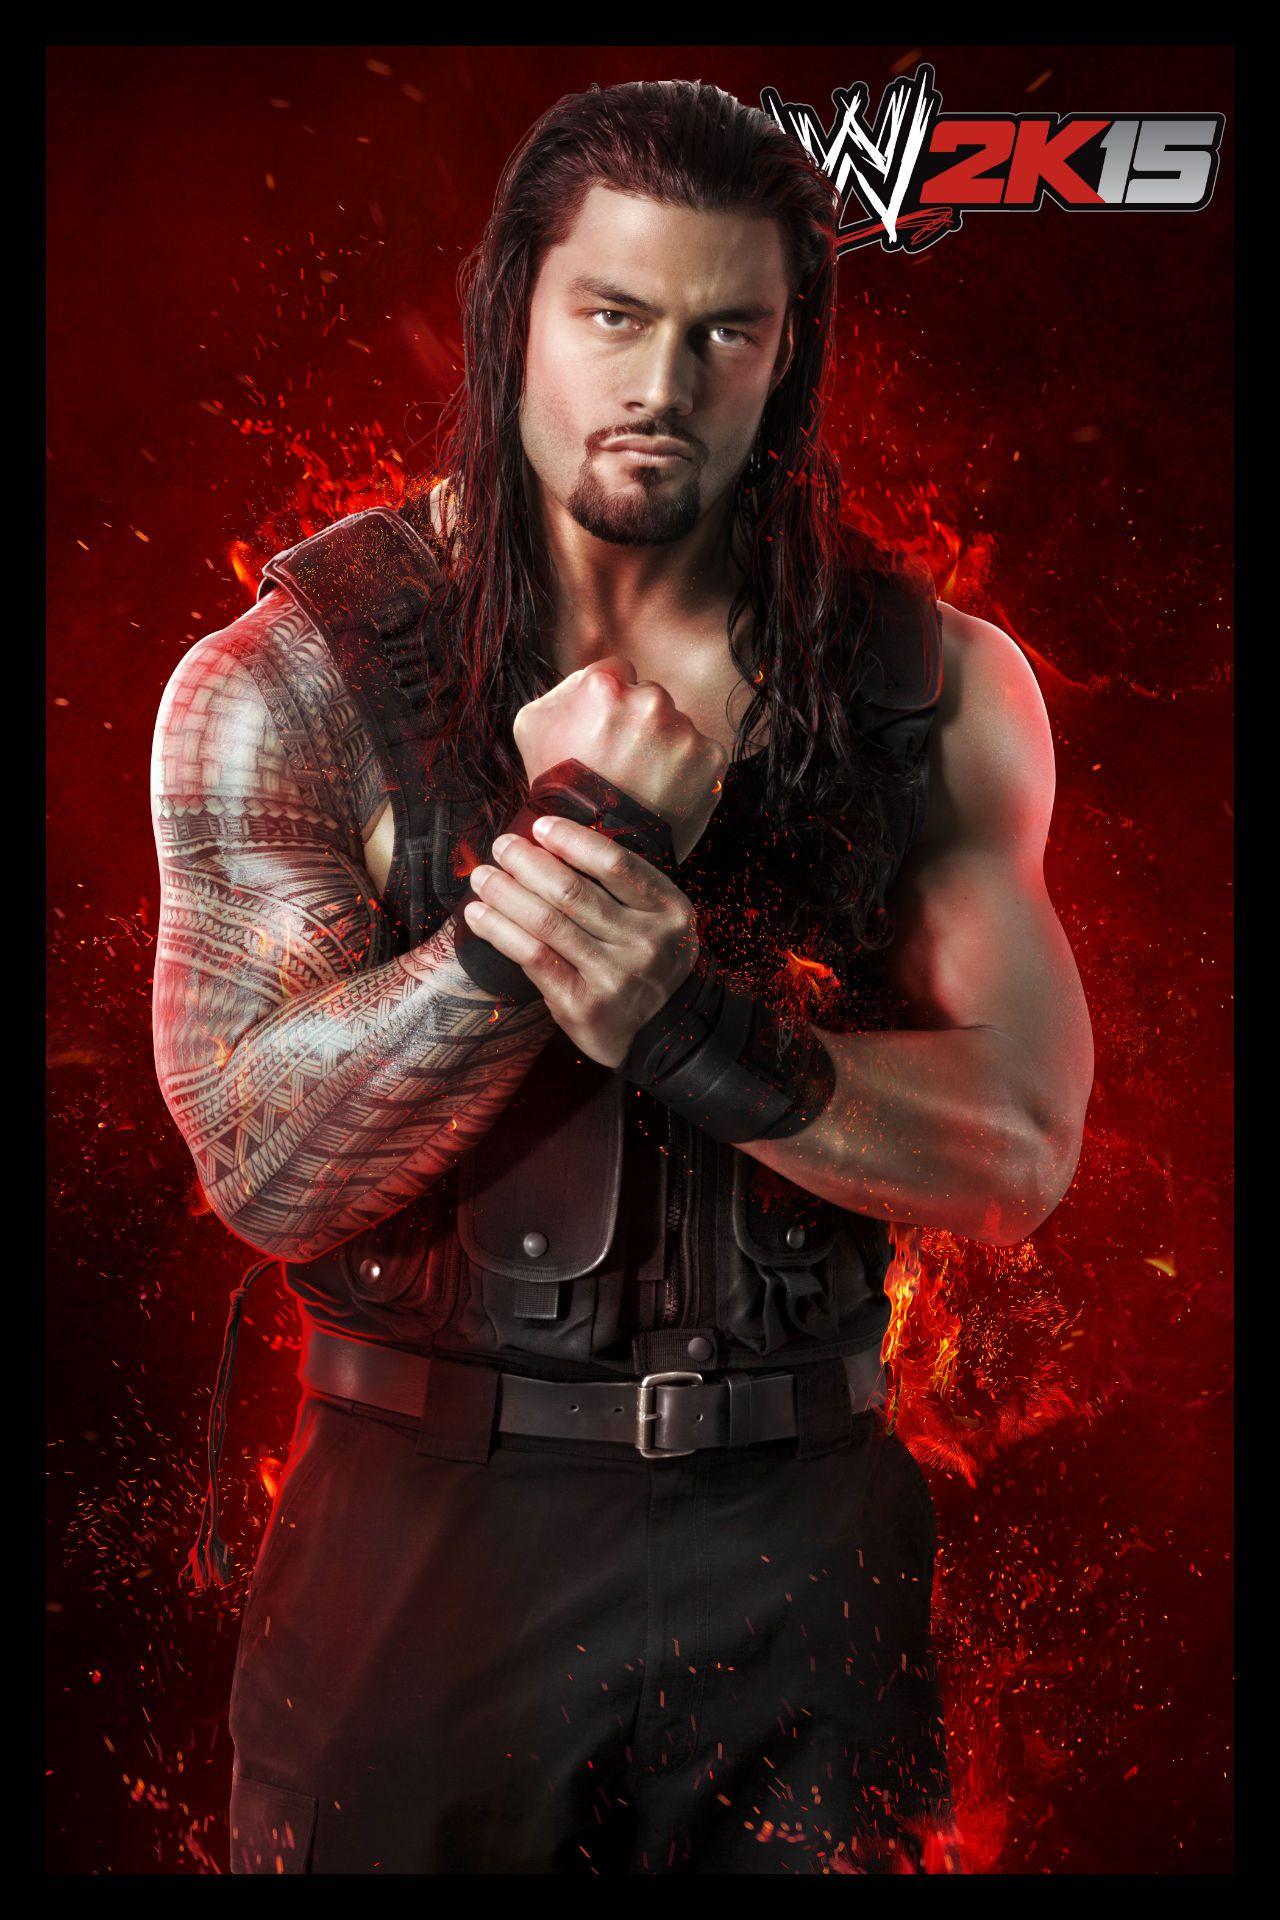 Roman Reigns Photo Wwe 2k15 Wwe Superstar Roman Reigns Wwe Roman Reigns Roman Reigns